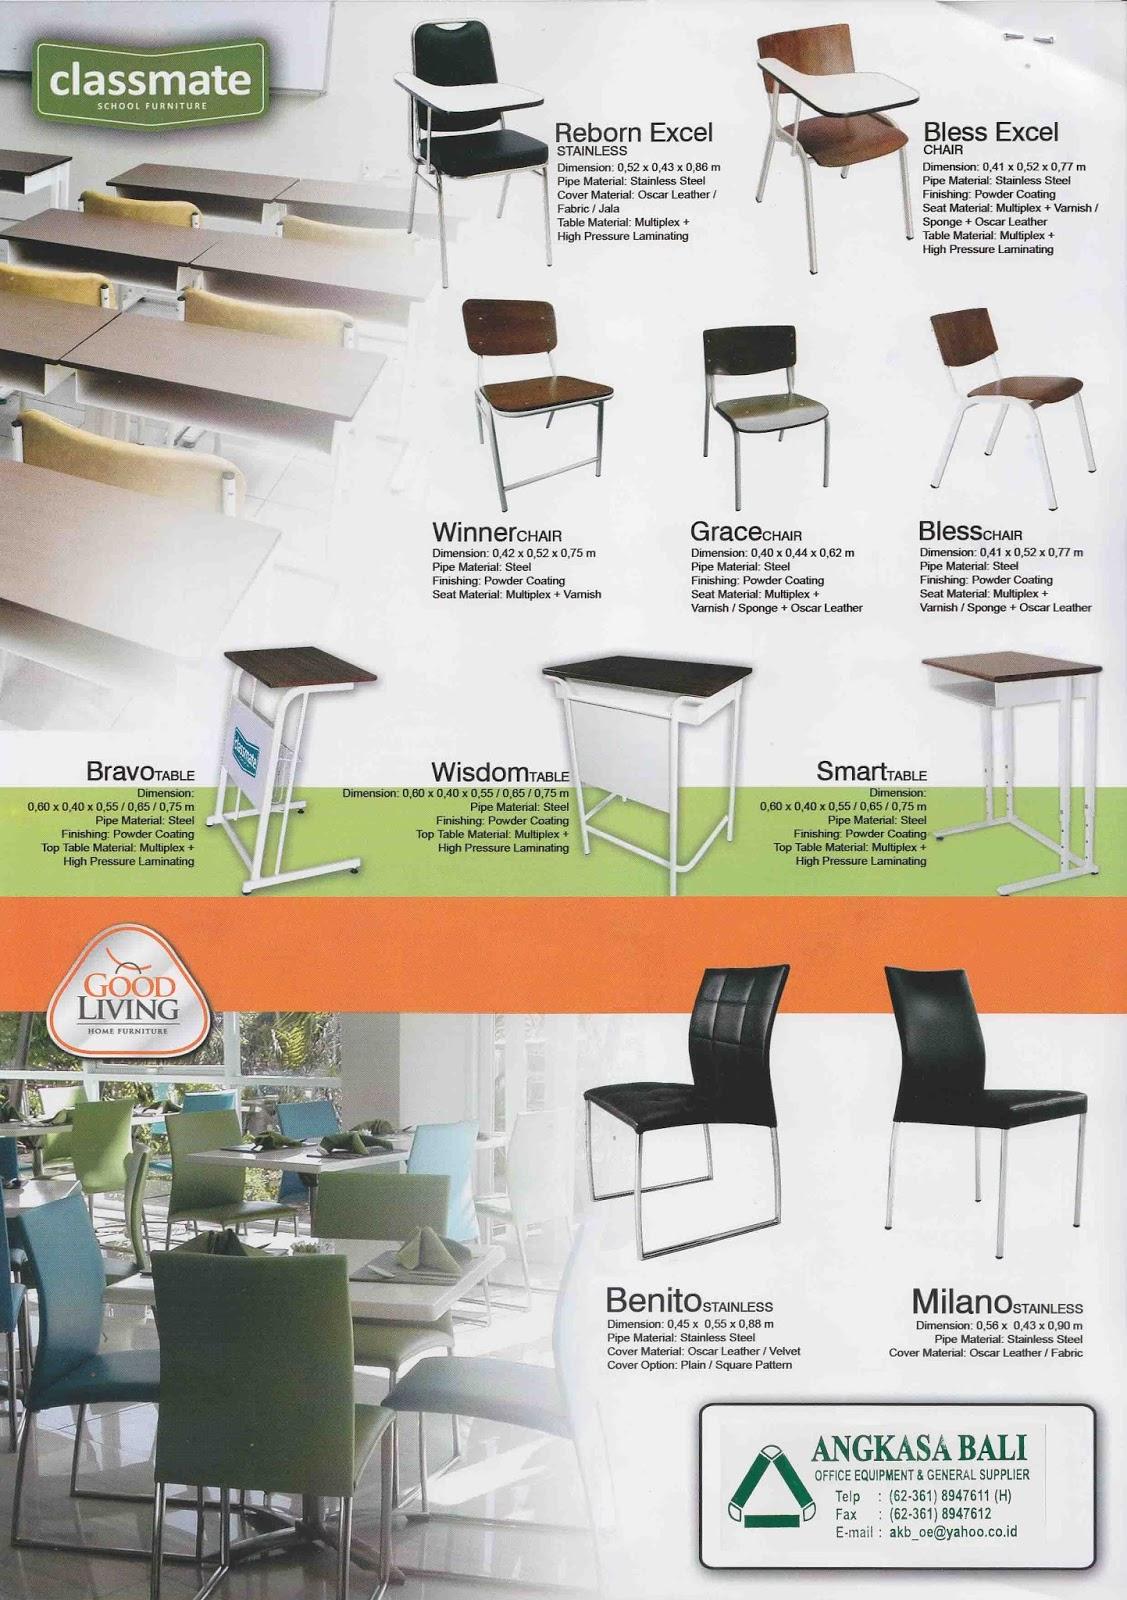 Angkasa Bali Furniture Distributor Kursi Meja Kantor Bali # Schema De Meuble Dimension